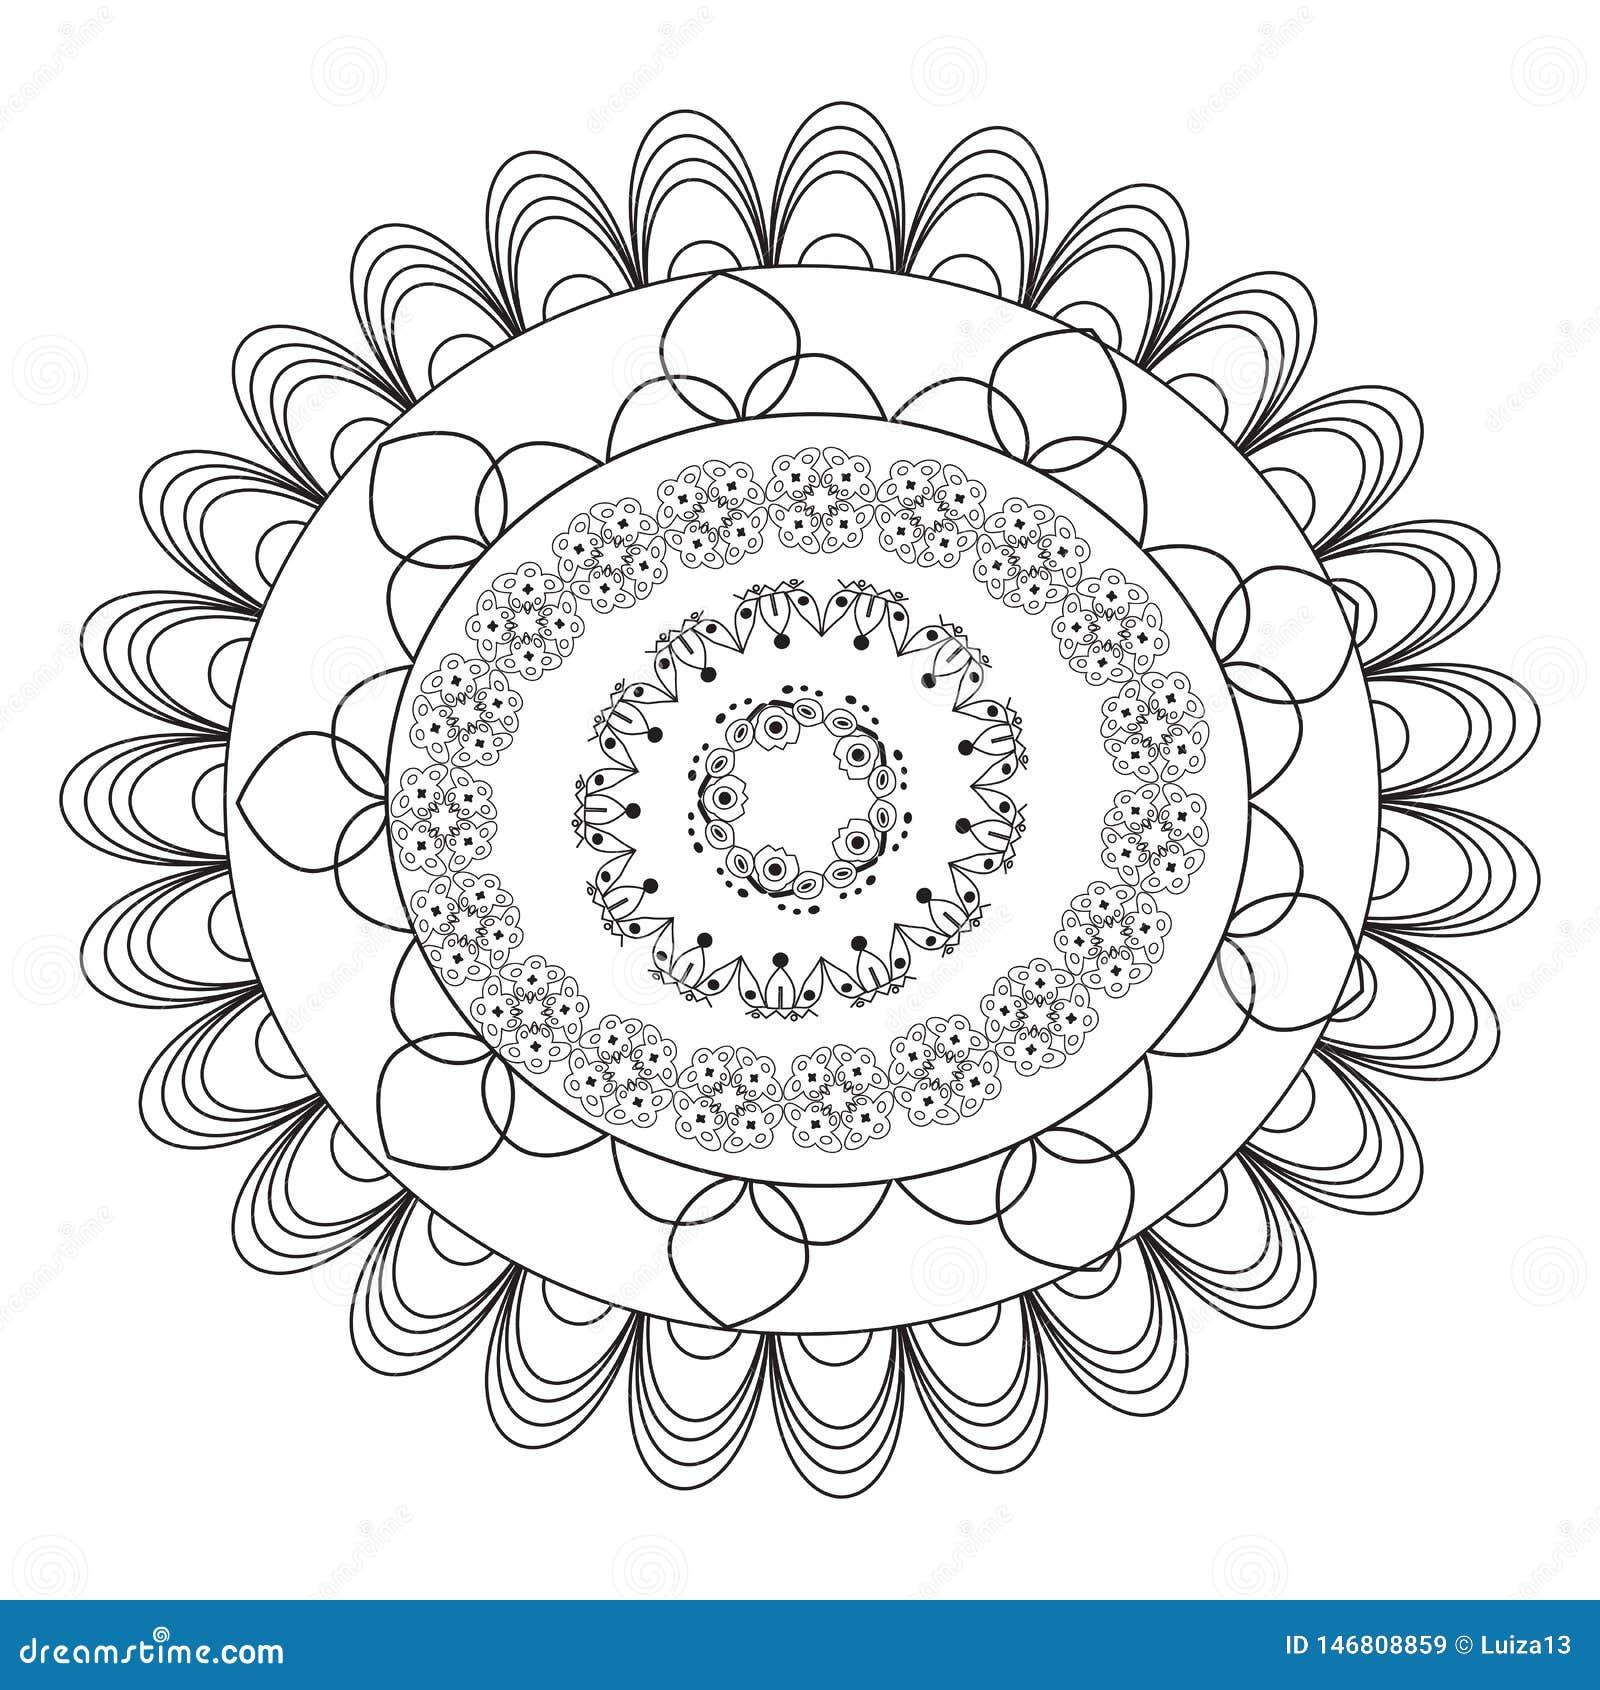 flower mandala vintage decorative elements oriental pattern vector illustration mandala coloring page circular pattern form